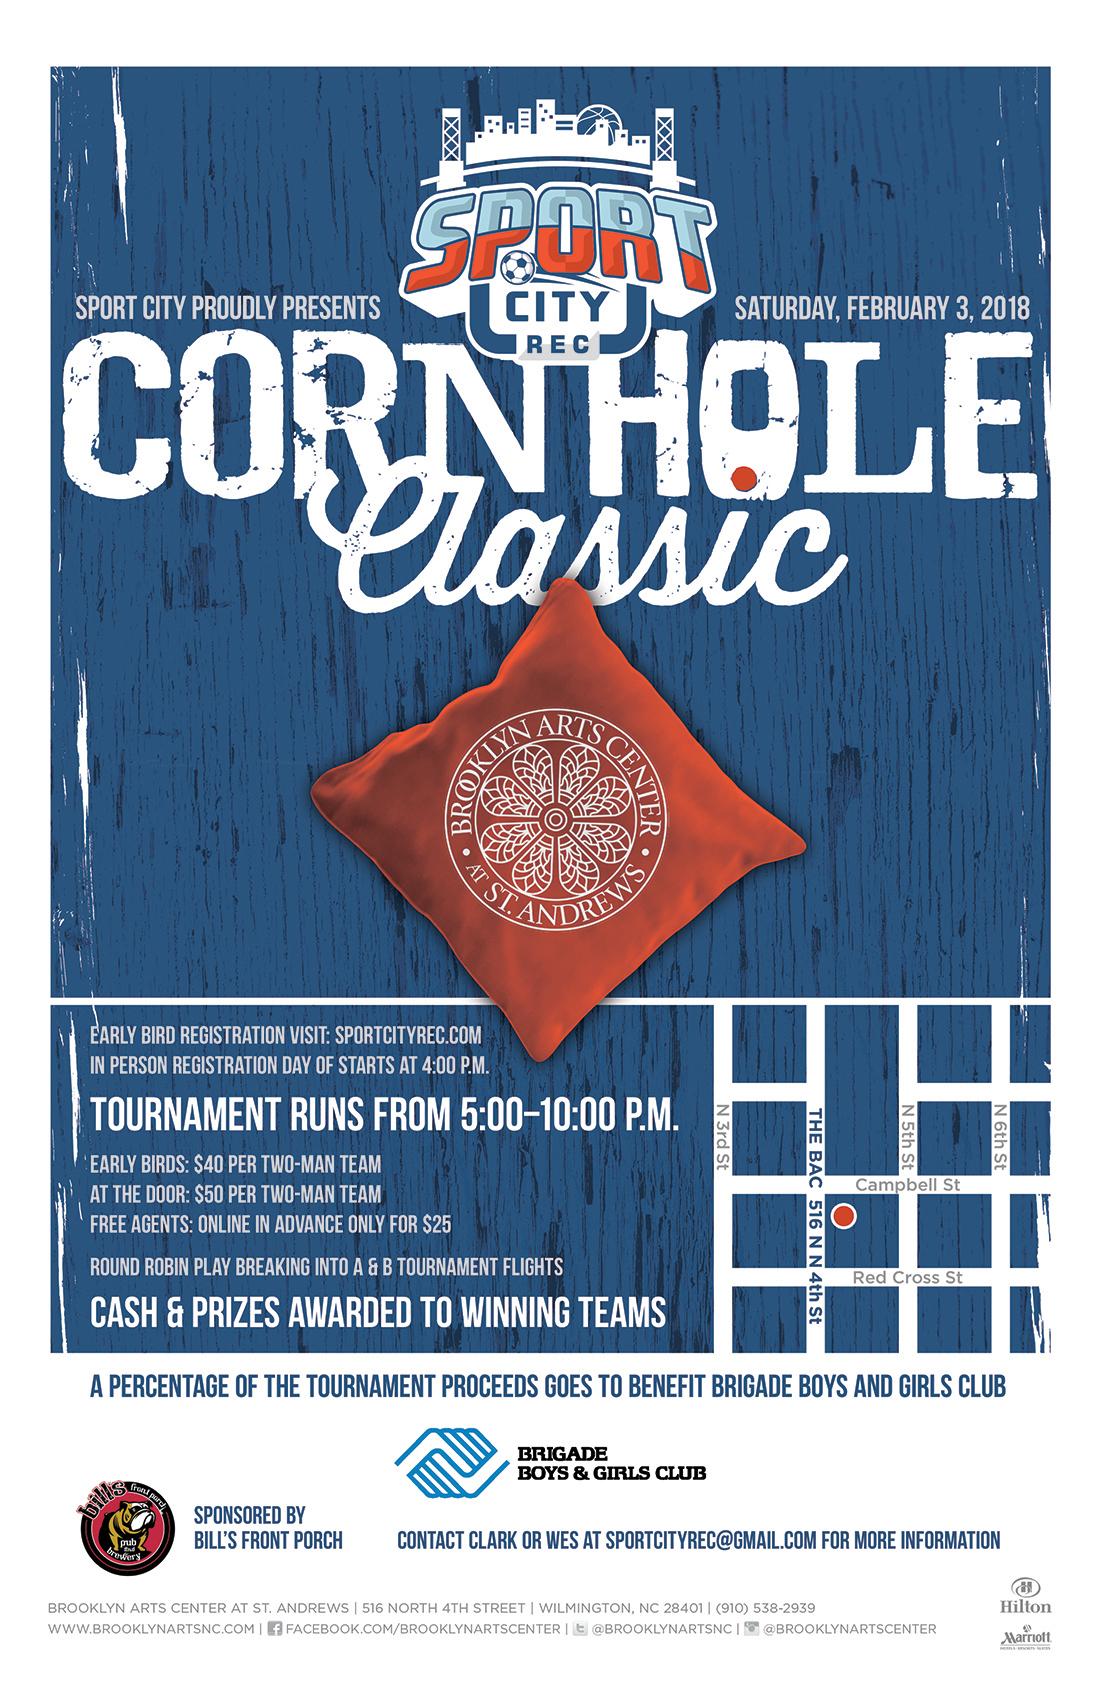 BAC-2009-Corn Hole Classic_poster-p2.jpg